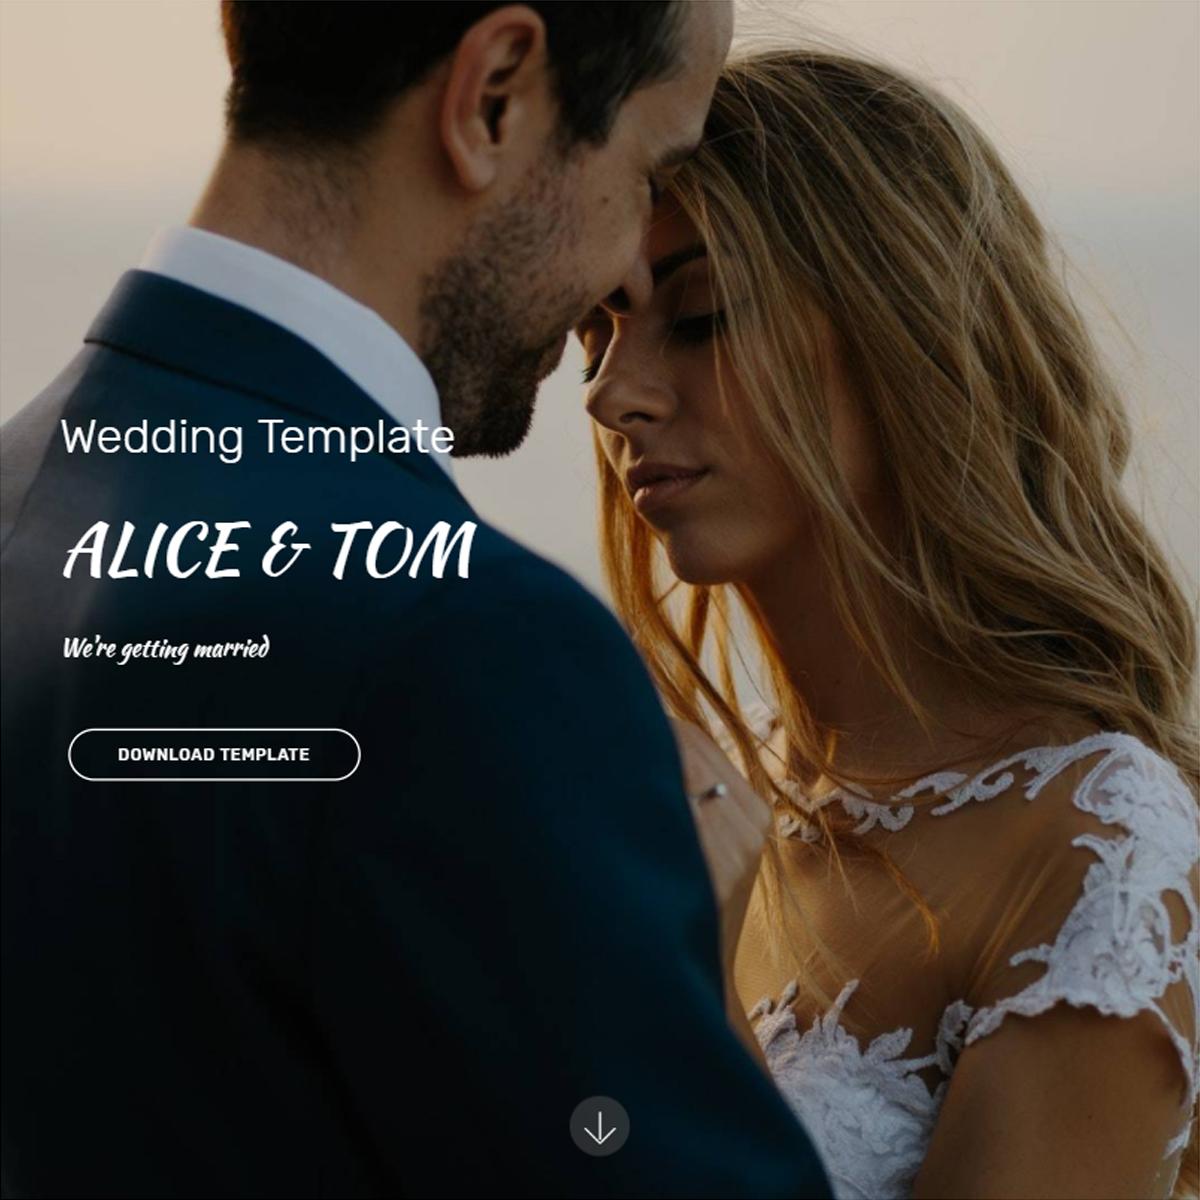 CSS3 Bootstrap Wedding Templates